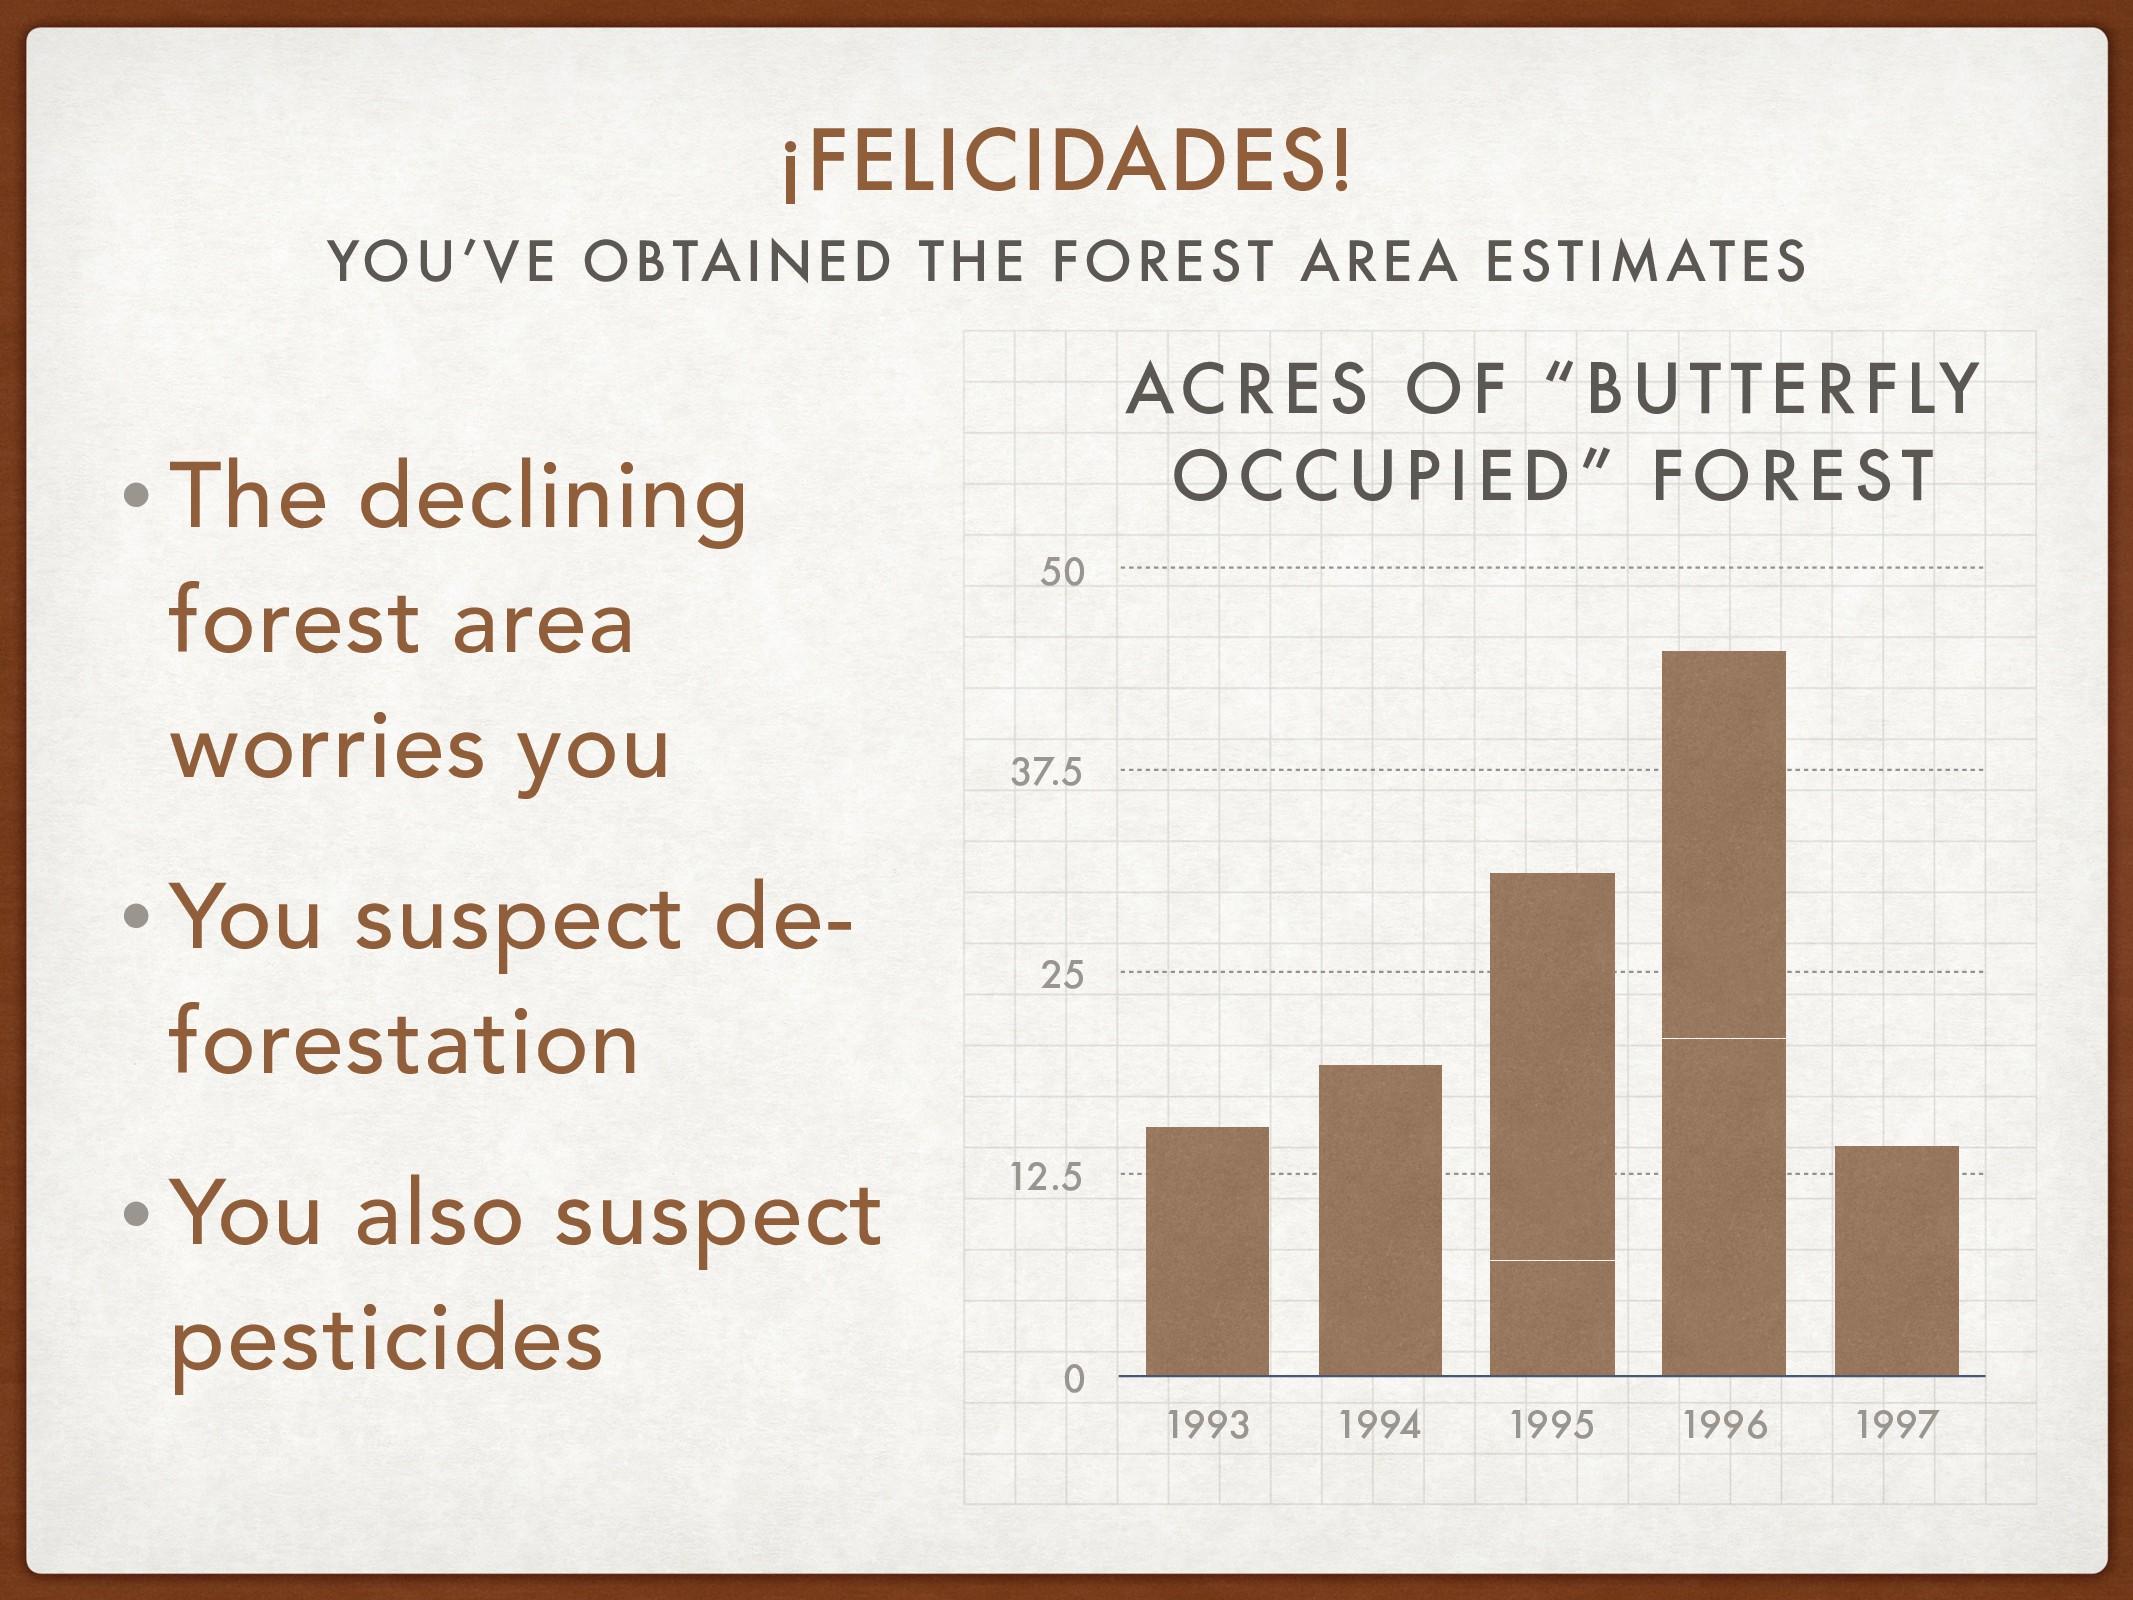 YOU'VE OBTAINED THE FOREST AREA ESTIMATES ¡FELI...